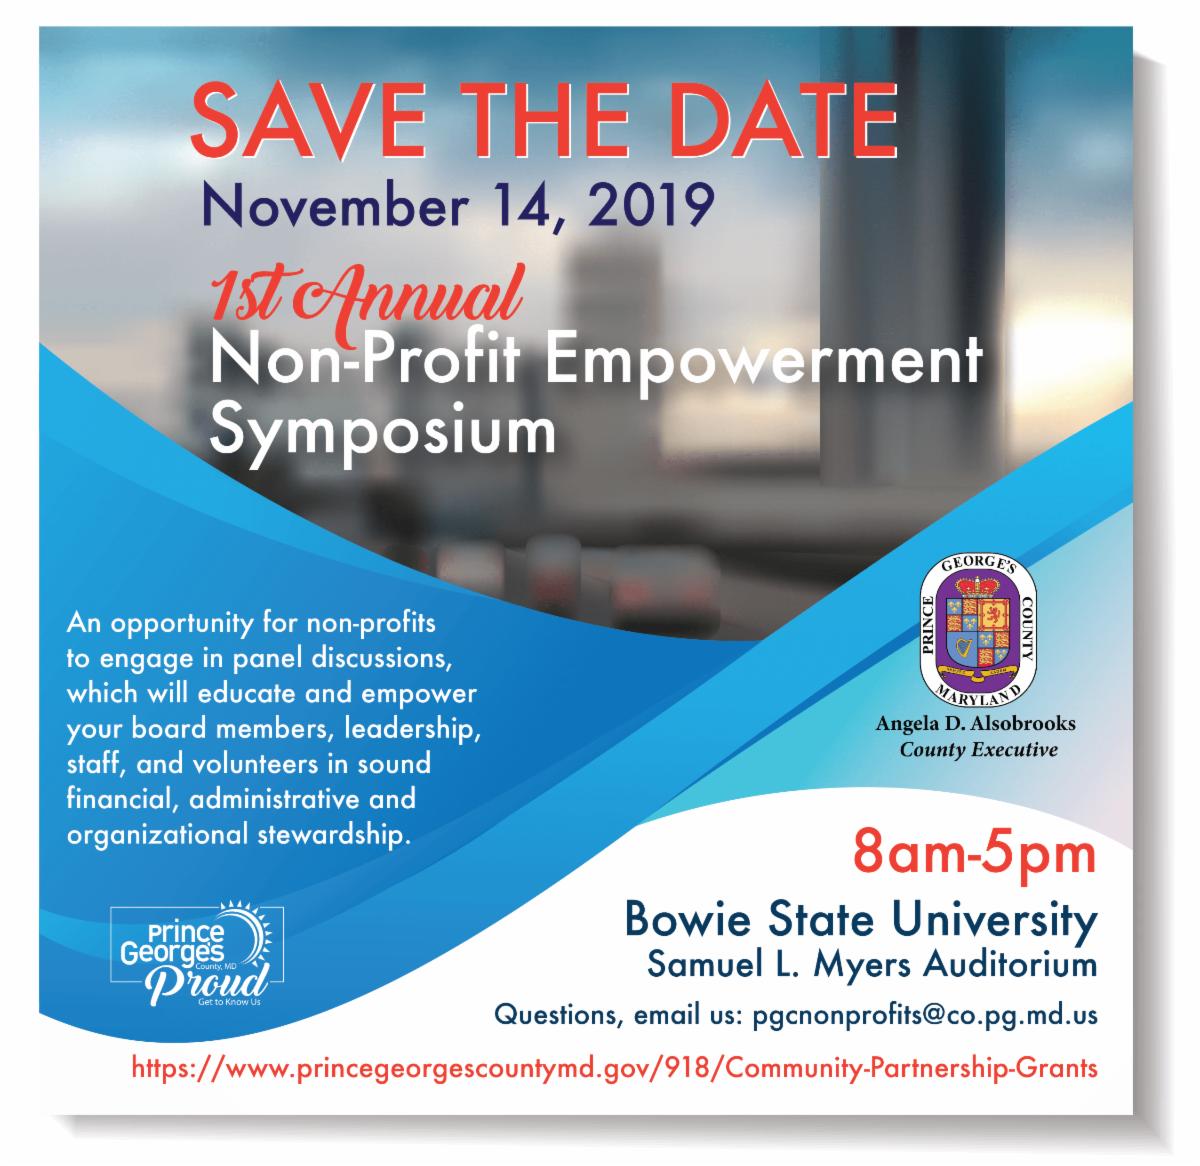 First Annual Nonprofit Empowerment Symposium